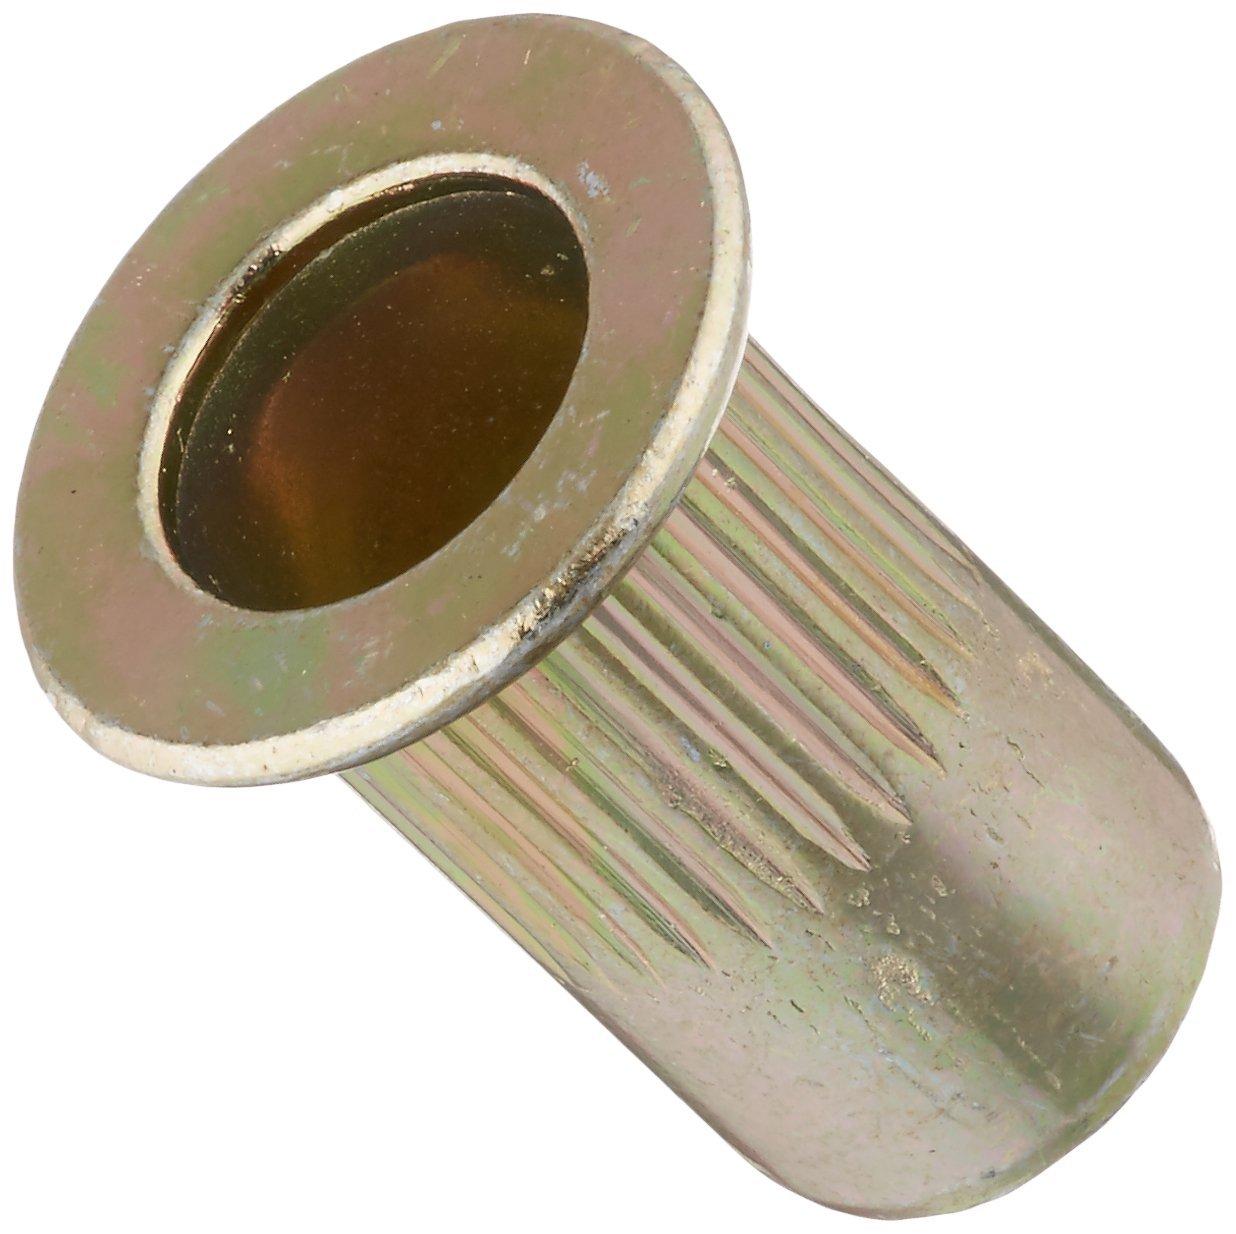 20Pcs Steel Rivet Nut Insert #10-24 uxcell a14121200ux0017